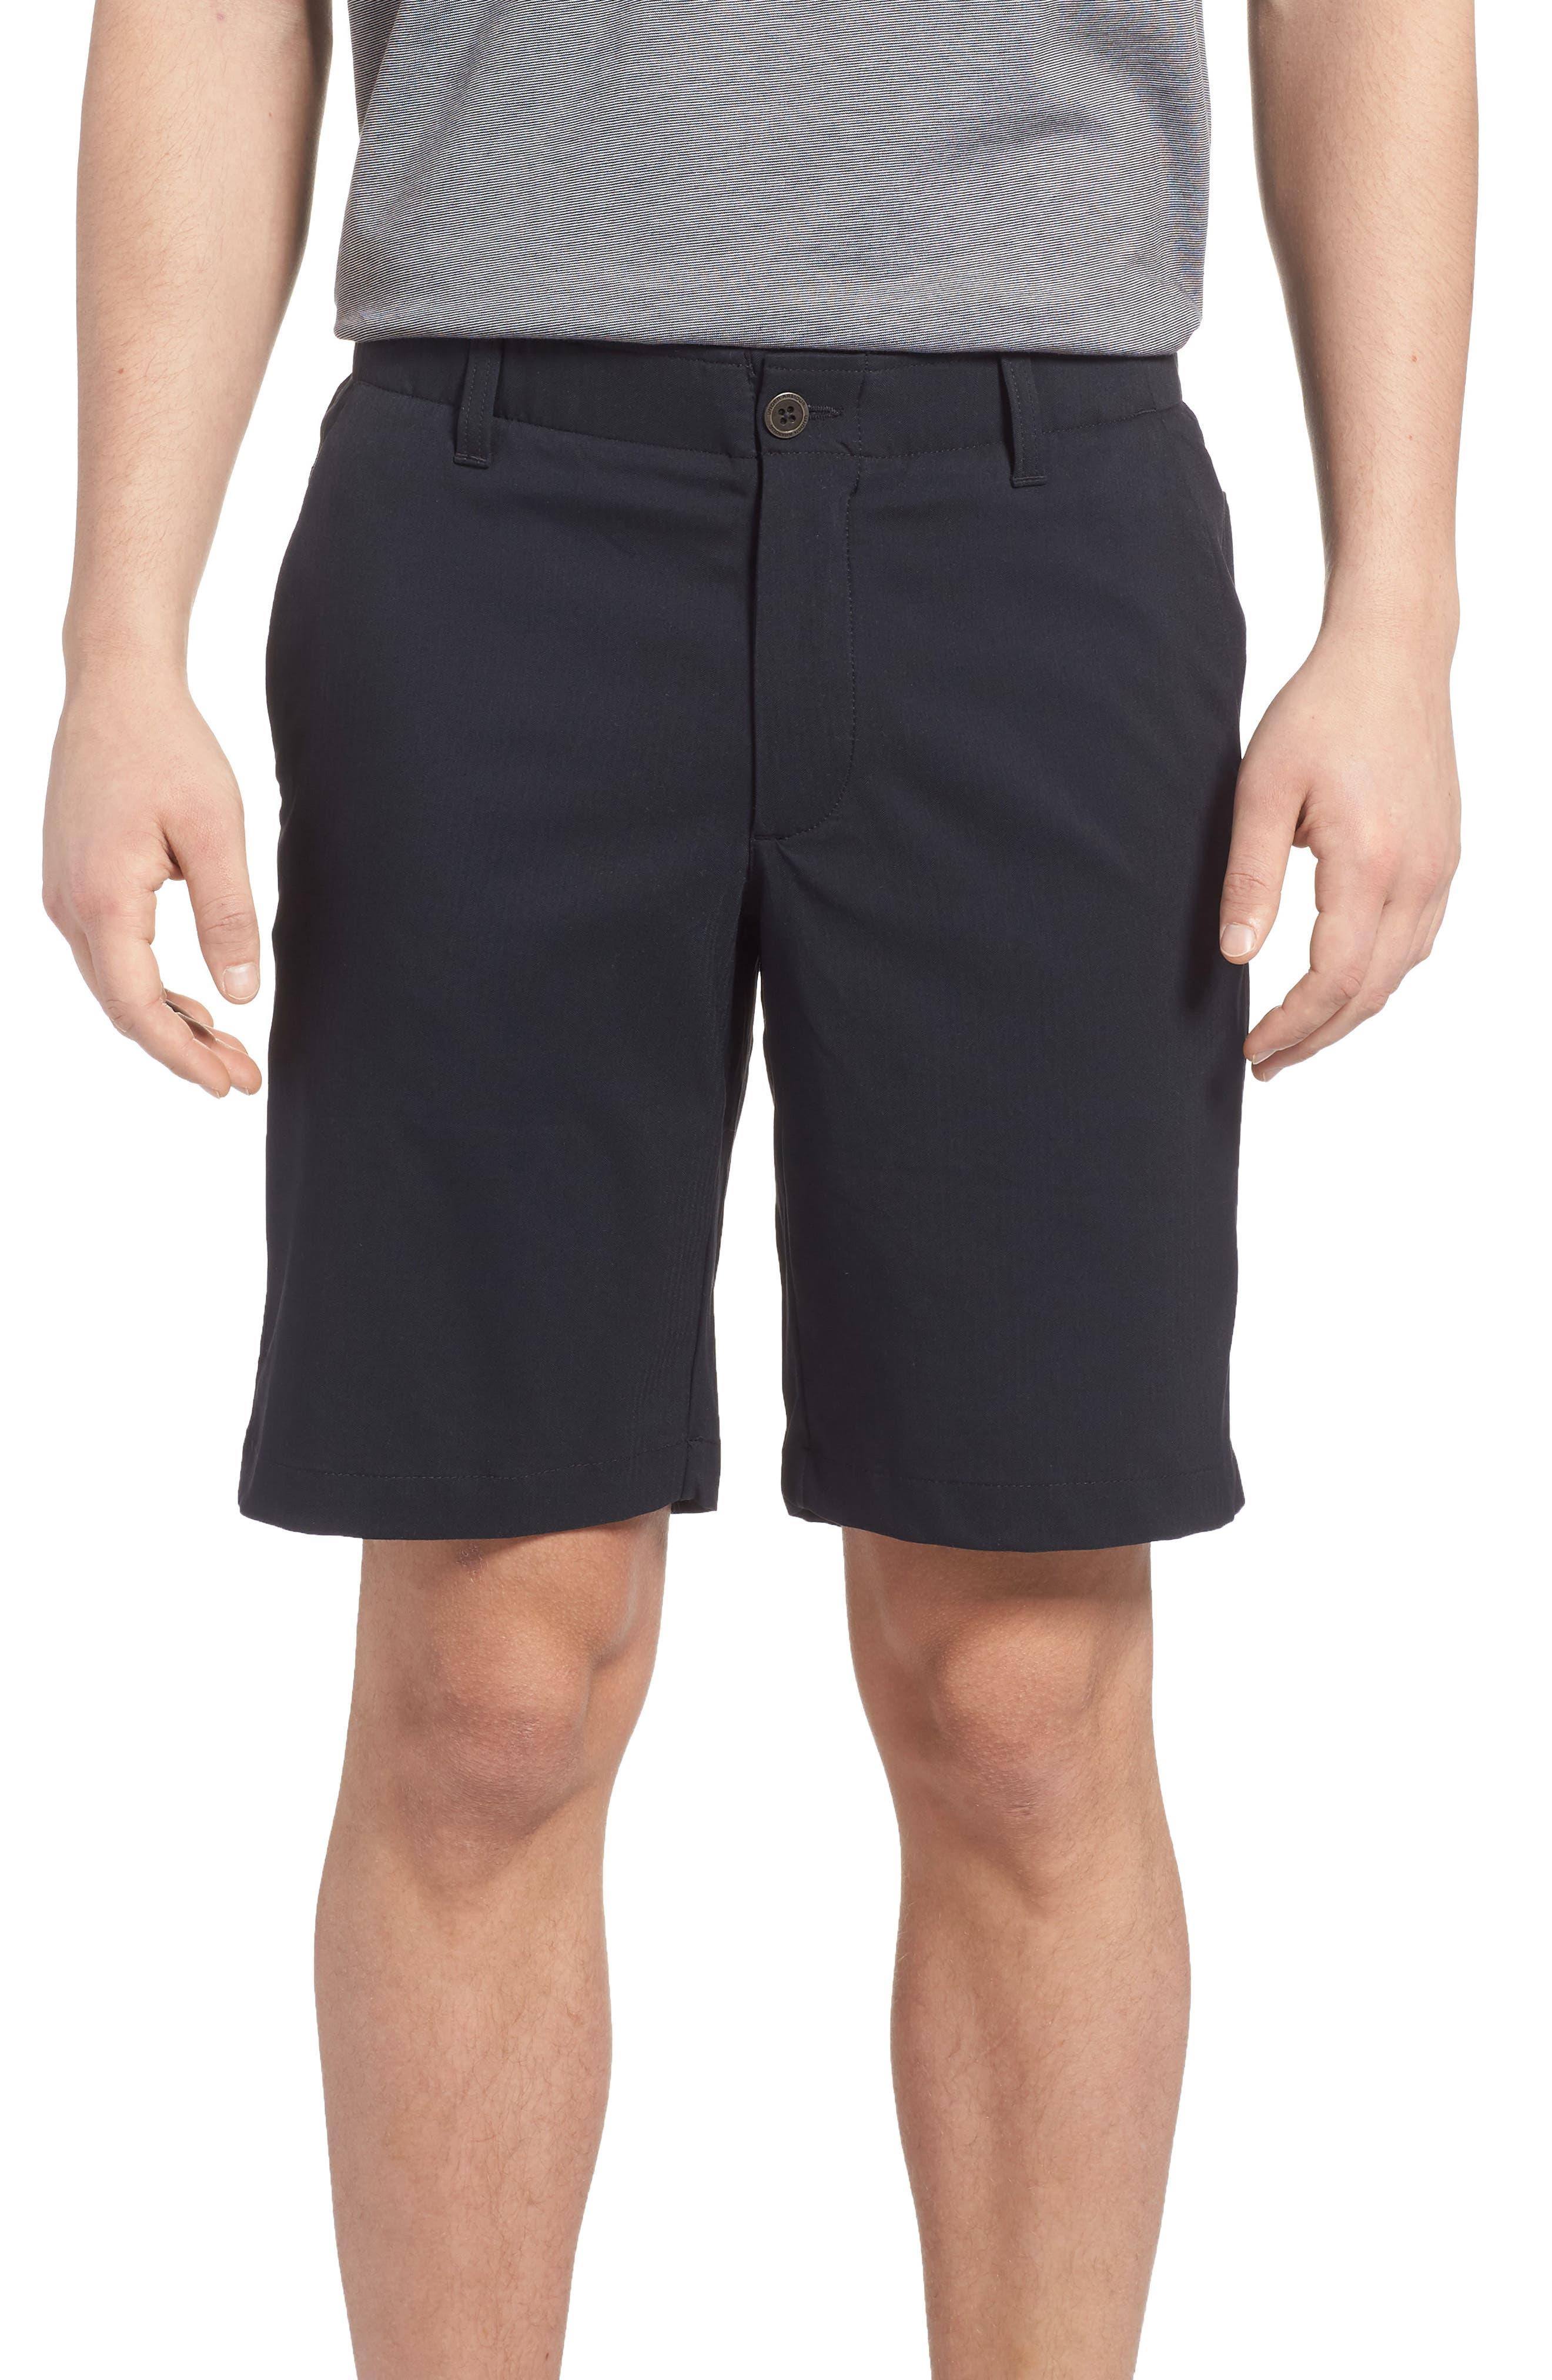 Takeover Regular Fit Golf Shorts,                             Main thumbnail 1, color,                             BLACK